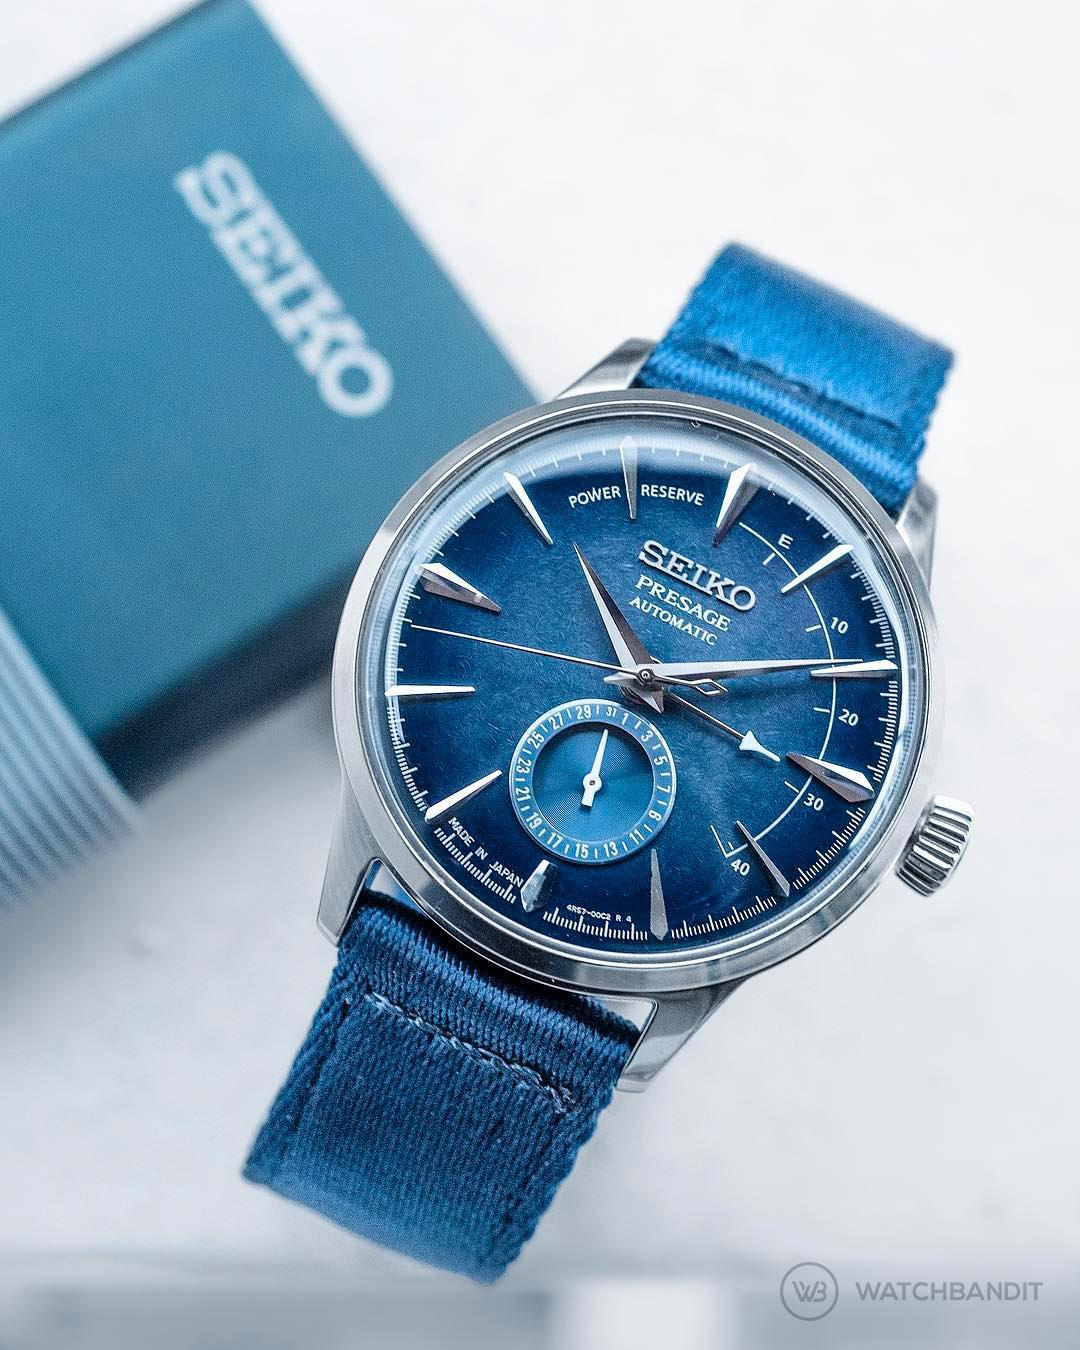 Seiko Persage Nato Blue